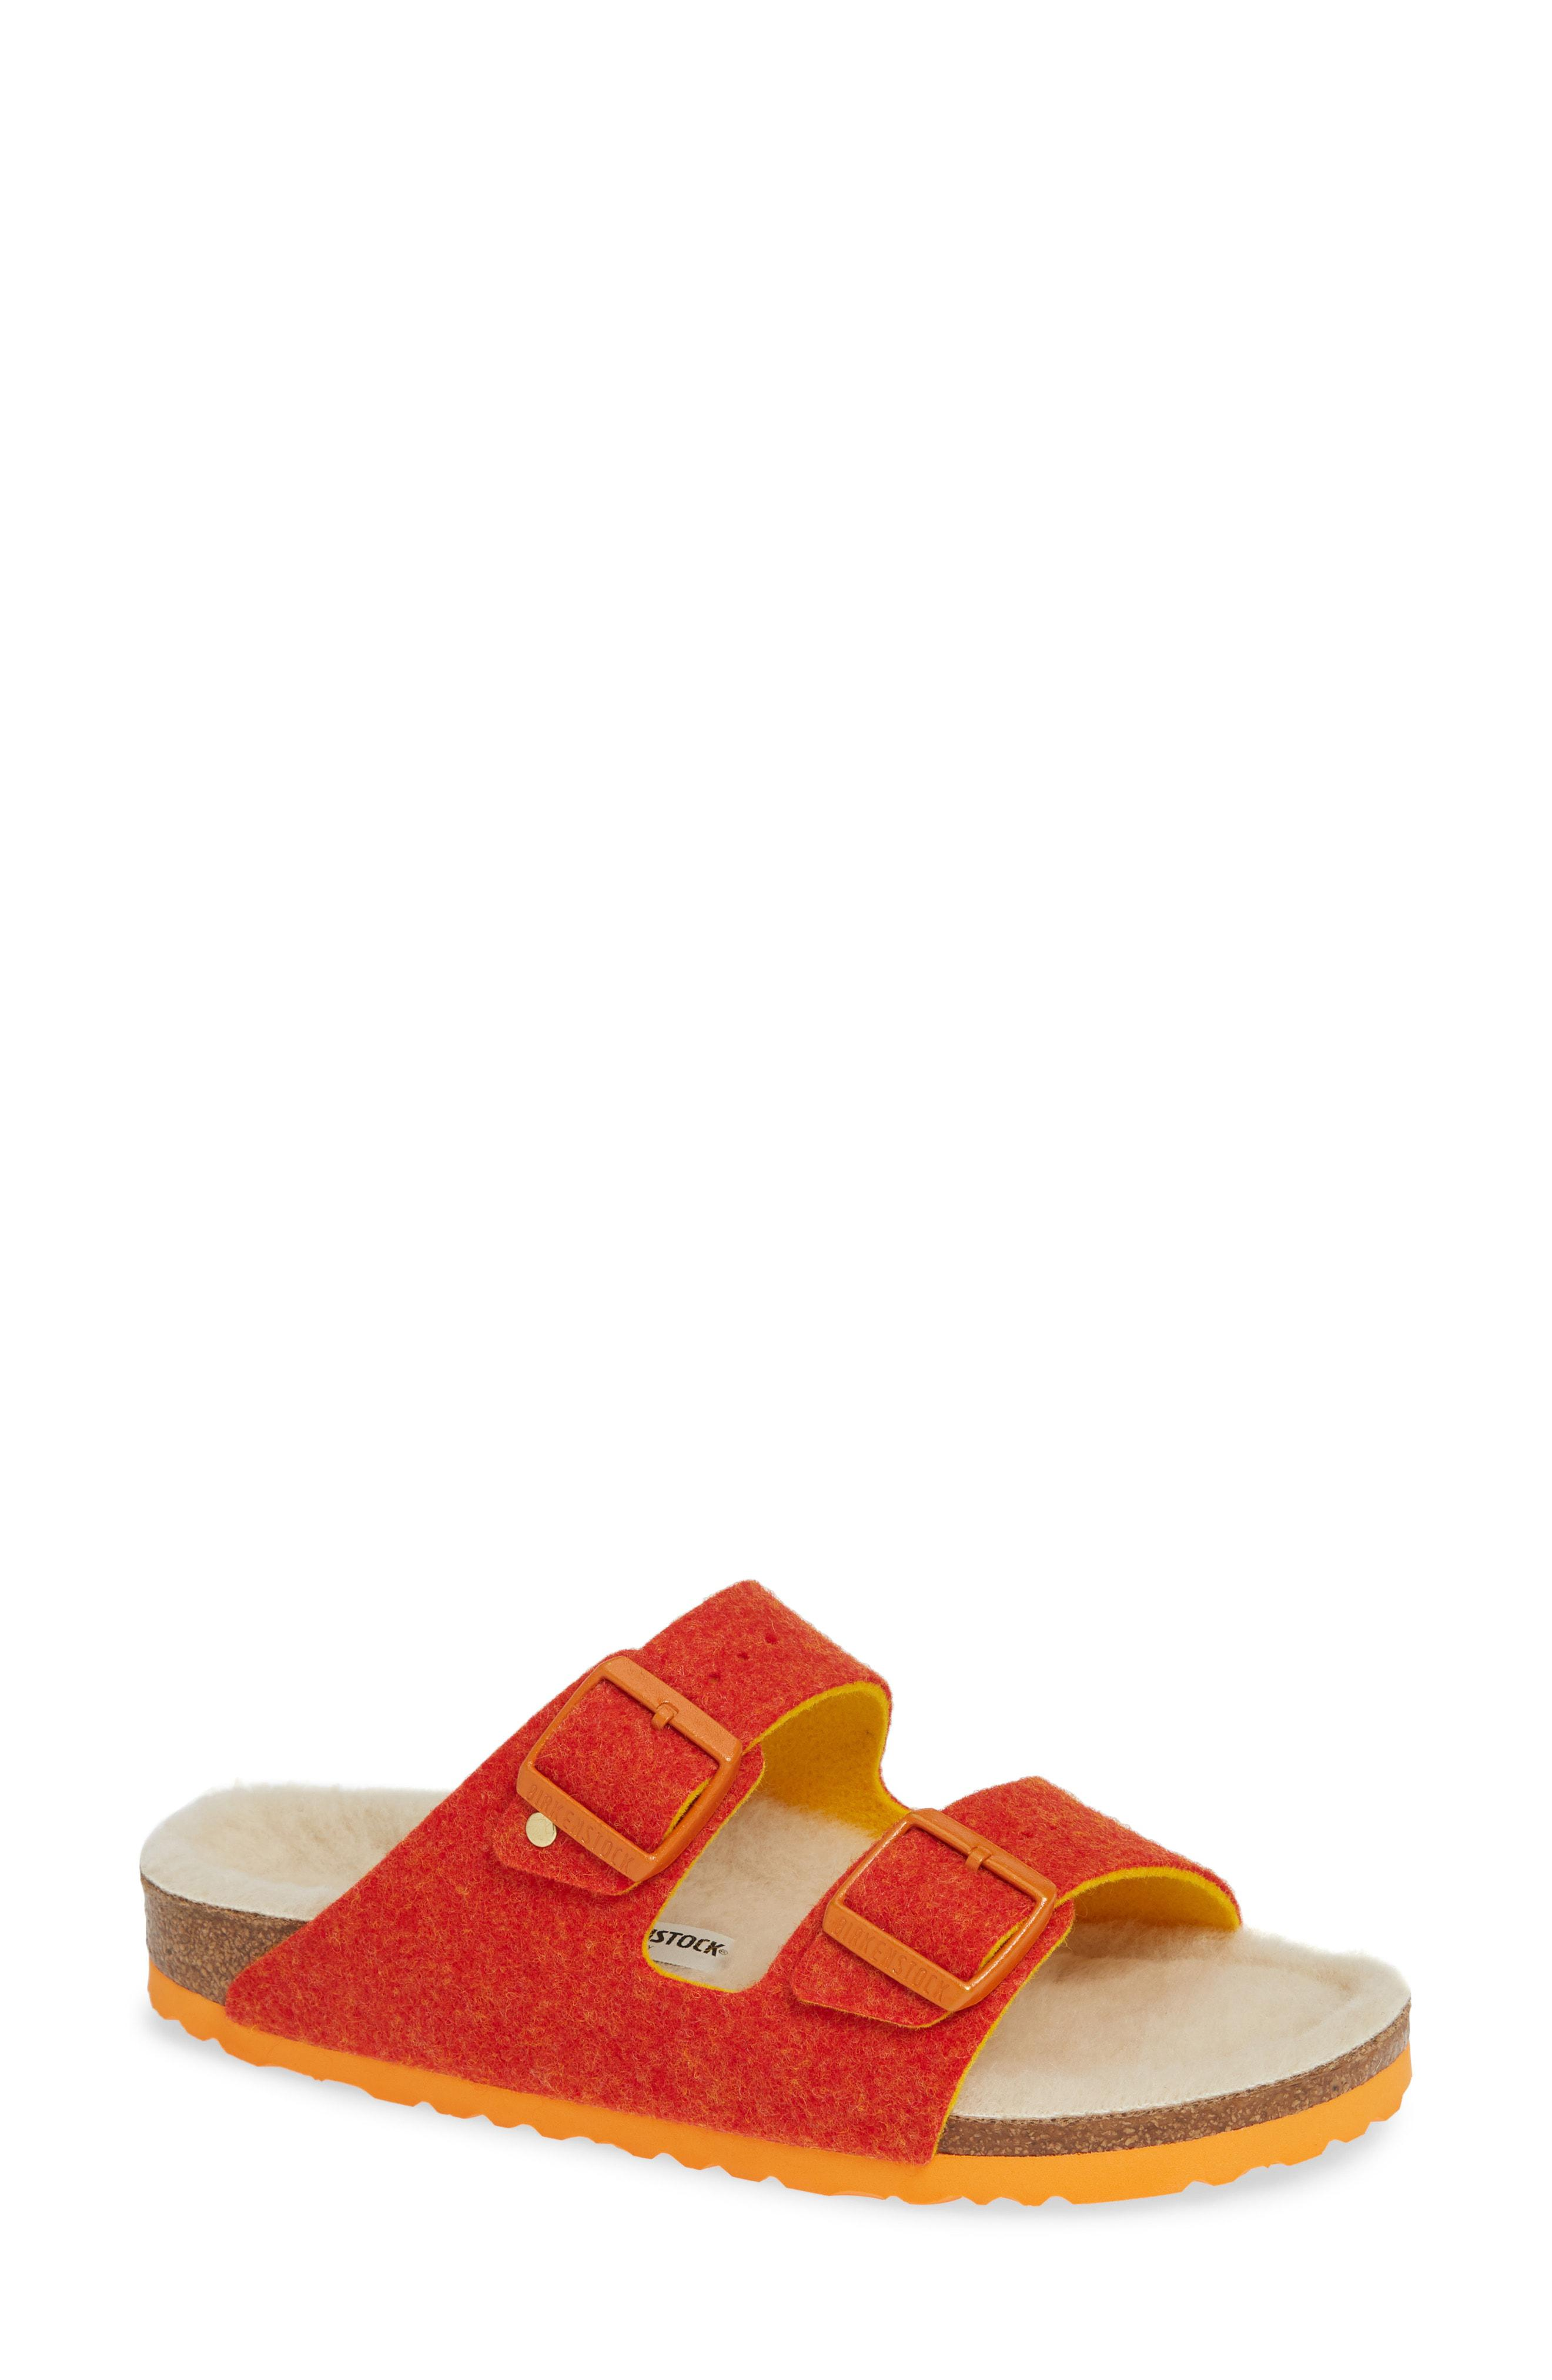 e22df1b6d804d6 Lyst - Birkenstock Arizona Happy Slide Sandal in Orange